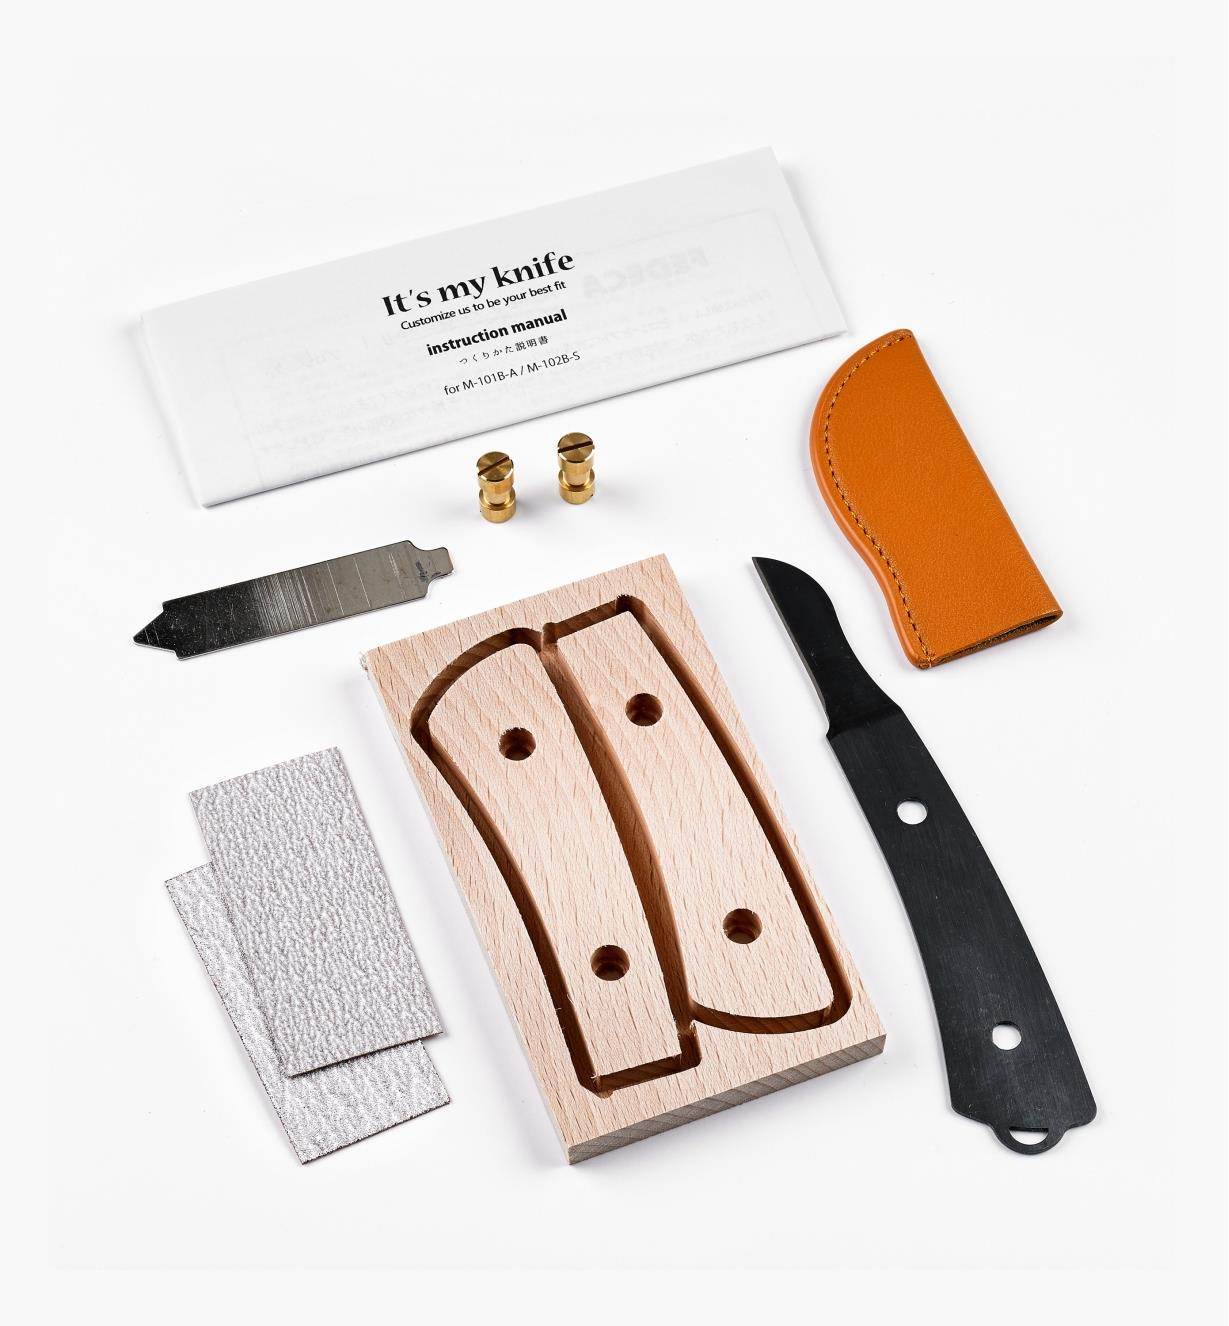 60K1103 - Japanese Carving Knife Kit